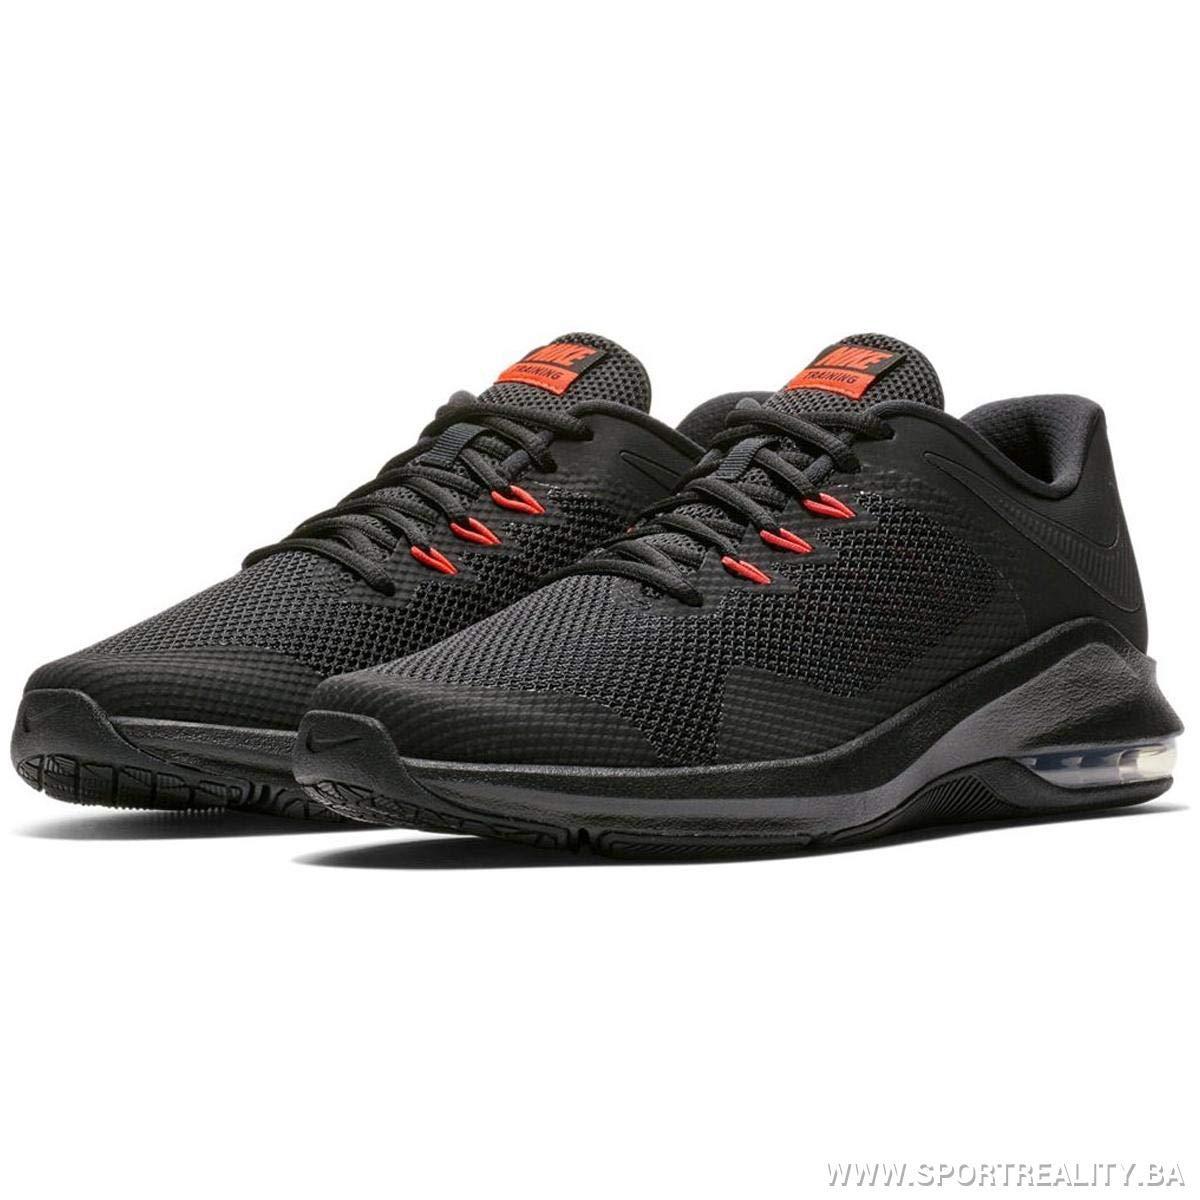 6f1476d39d Amazon.com   Nike Men's Air Max Alpha Trainer Training Shoe,  Black/Black/Bright Crimson, Size 6.5   Fitness & Cross-Training